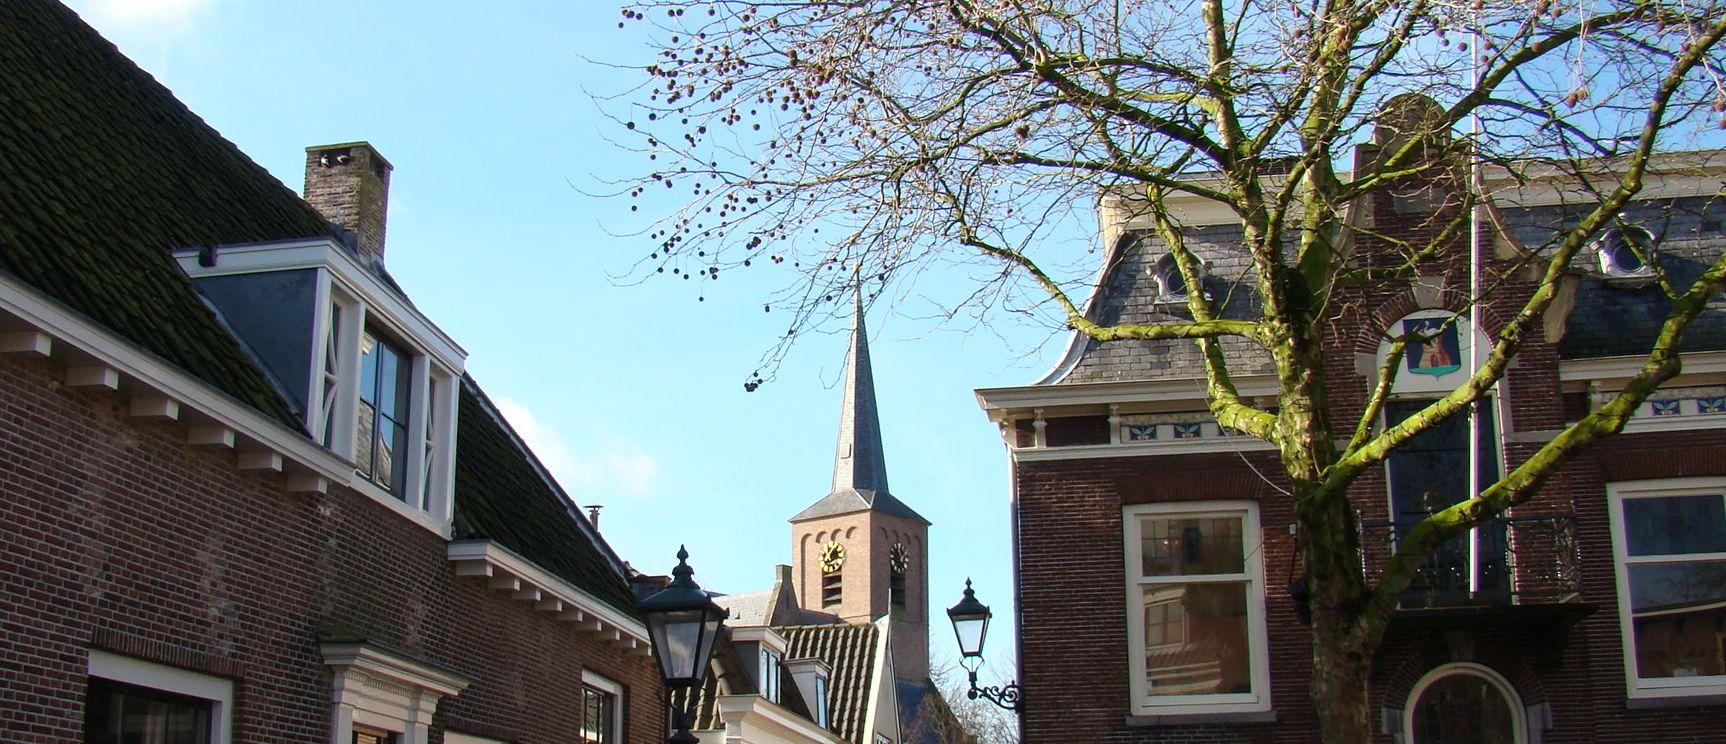 Huisartsenpraktijk Zwammerdam